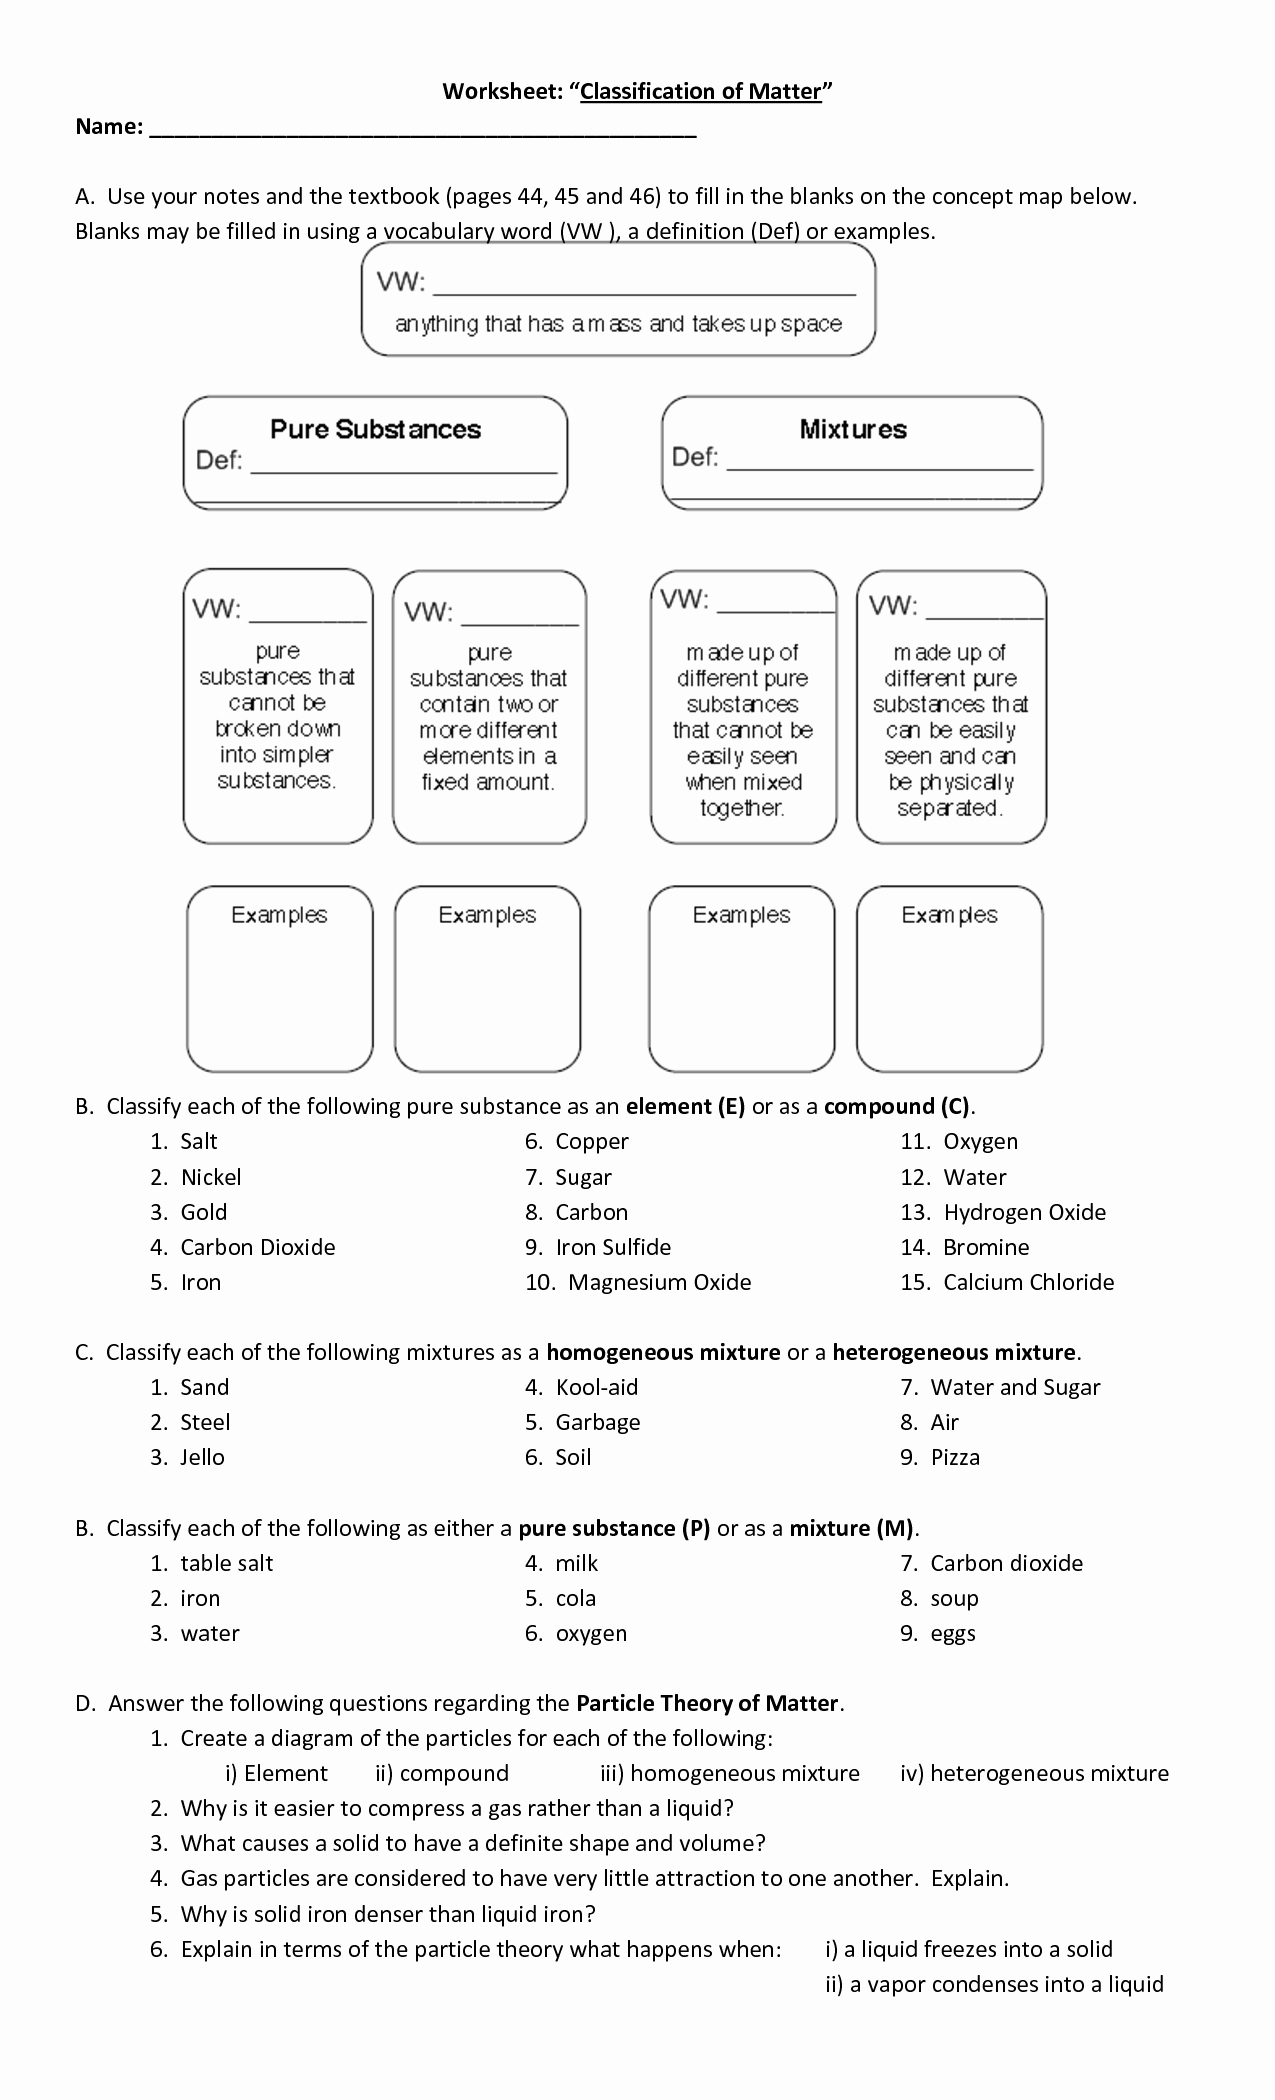 50 Classifying Matter Worksheet Answers